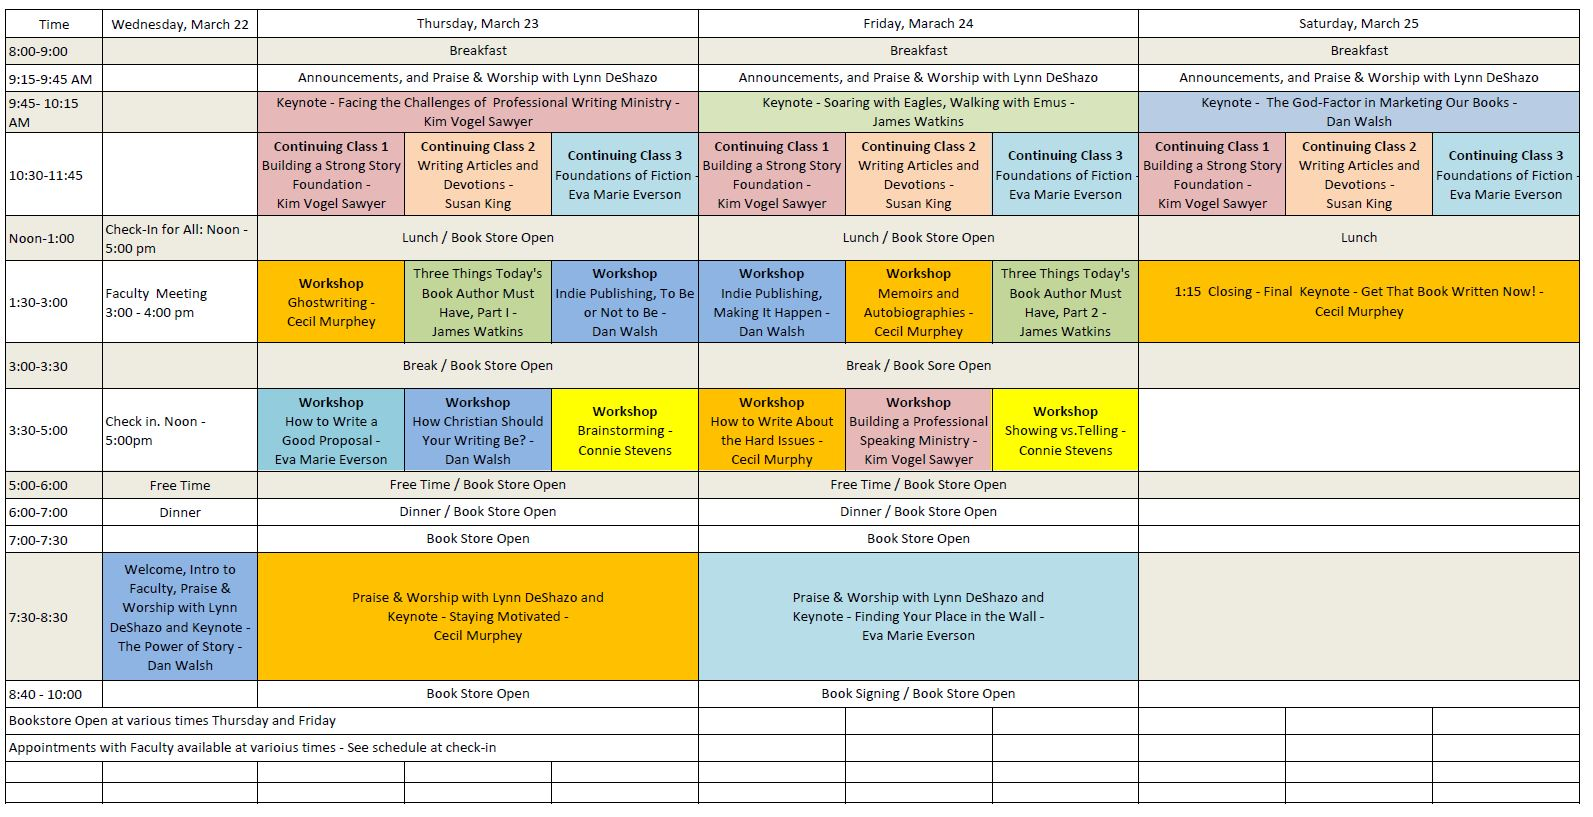 cwr-schedule-7mar2017